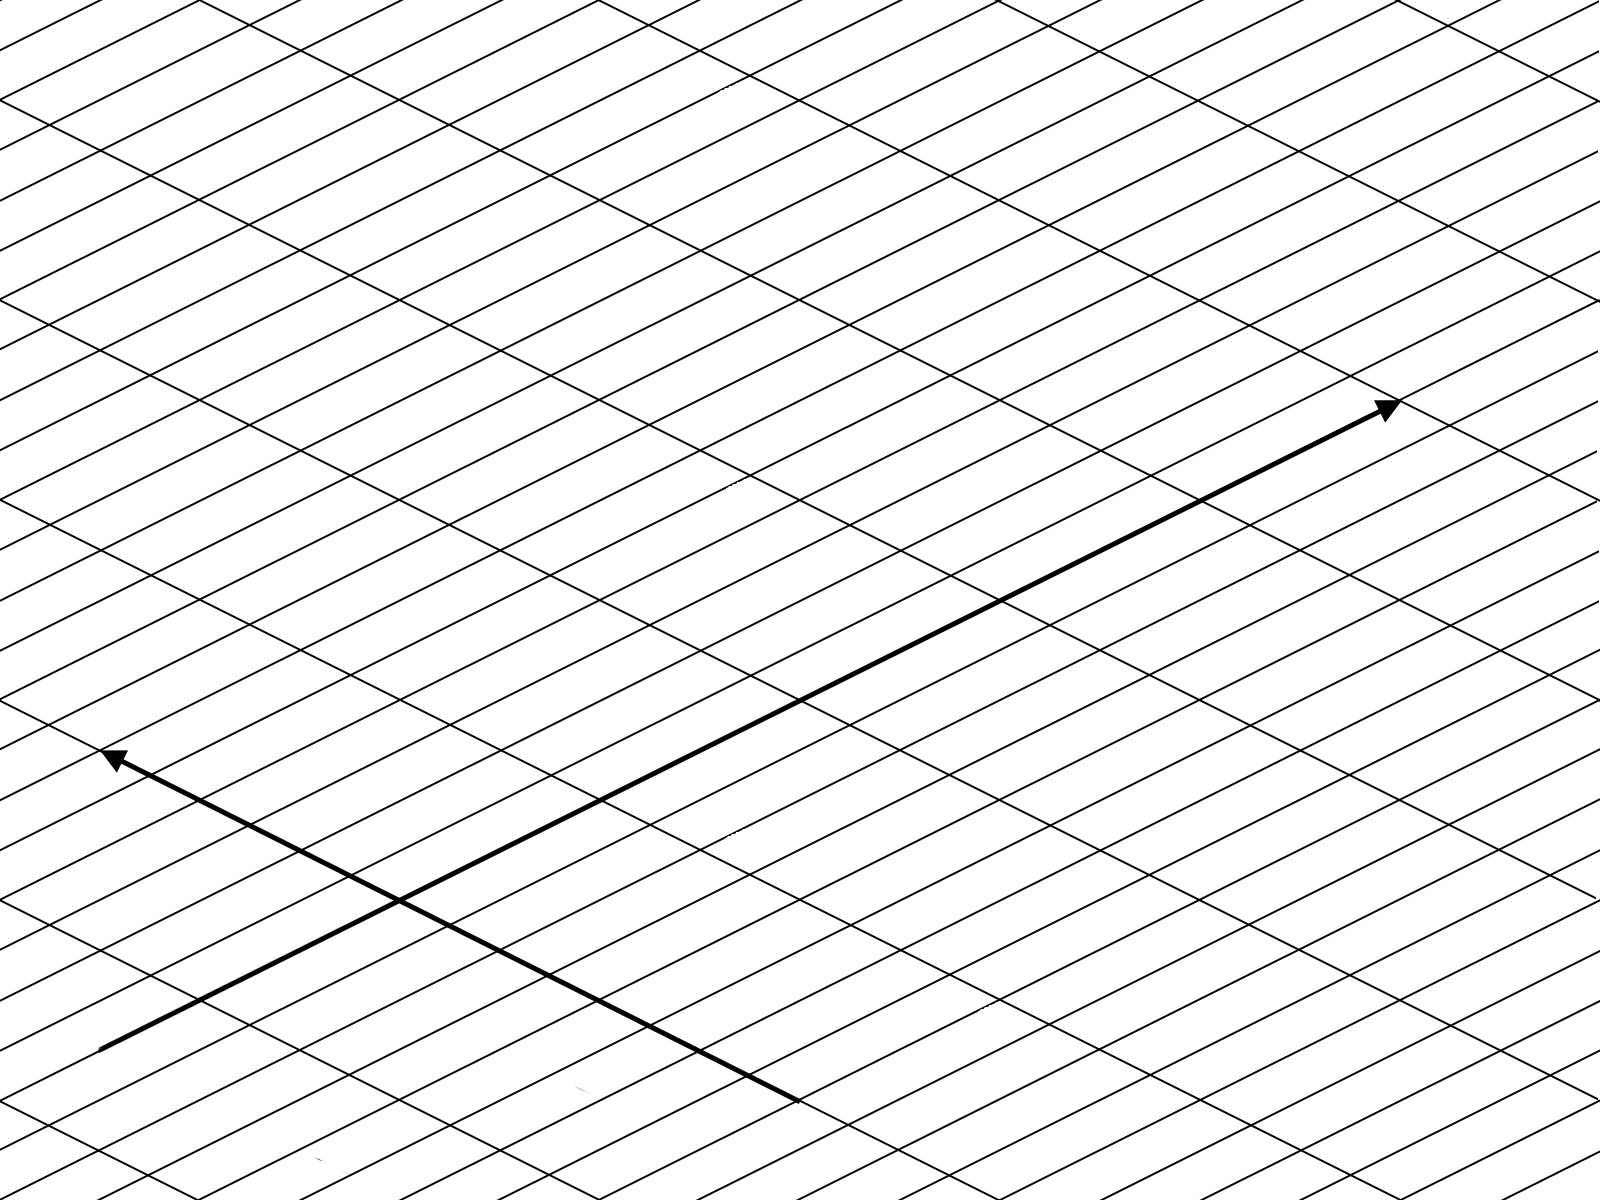 https://remedics.air-nifty.com/photos/uncategorized/tensor23.png